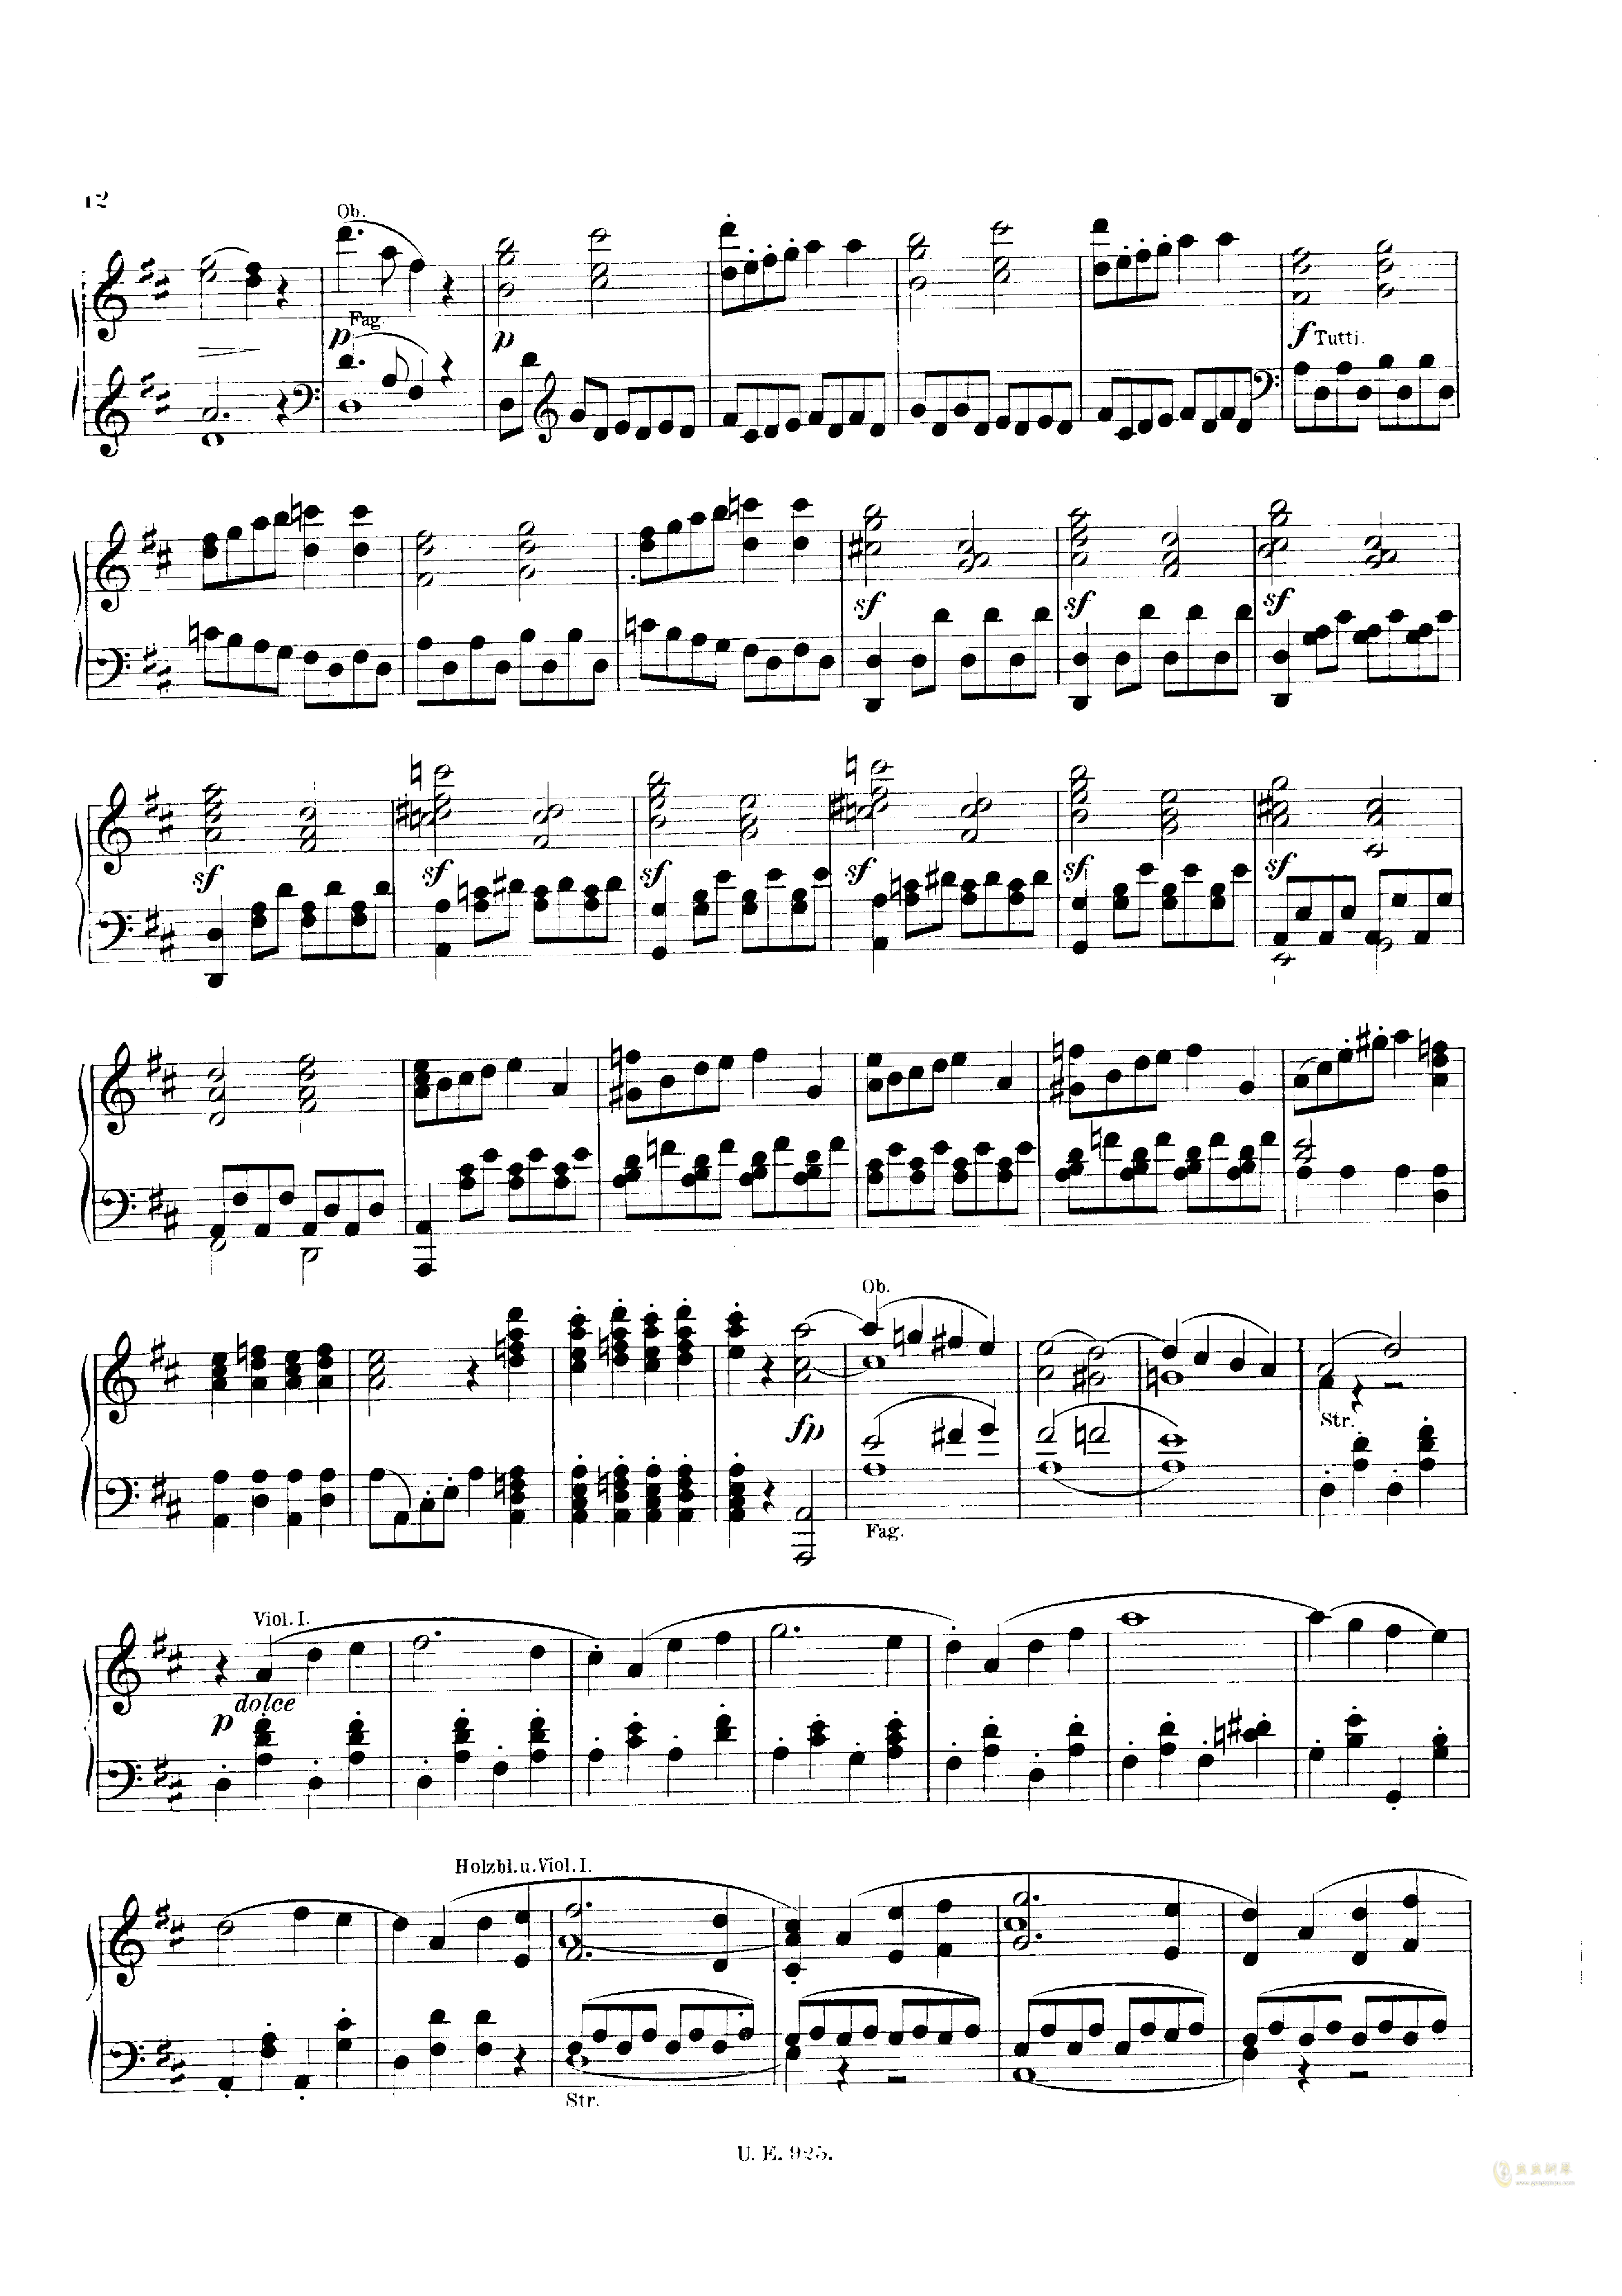 D大调第一交响曲钢琴谱 第12页